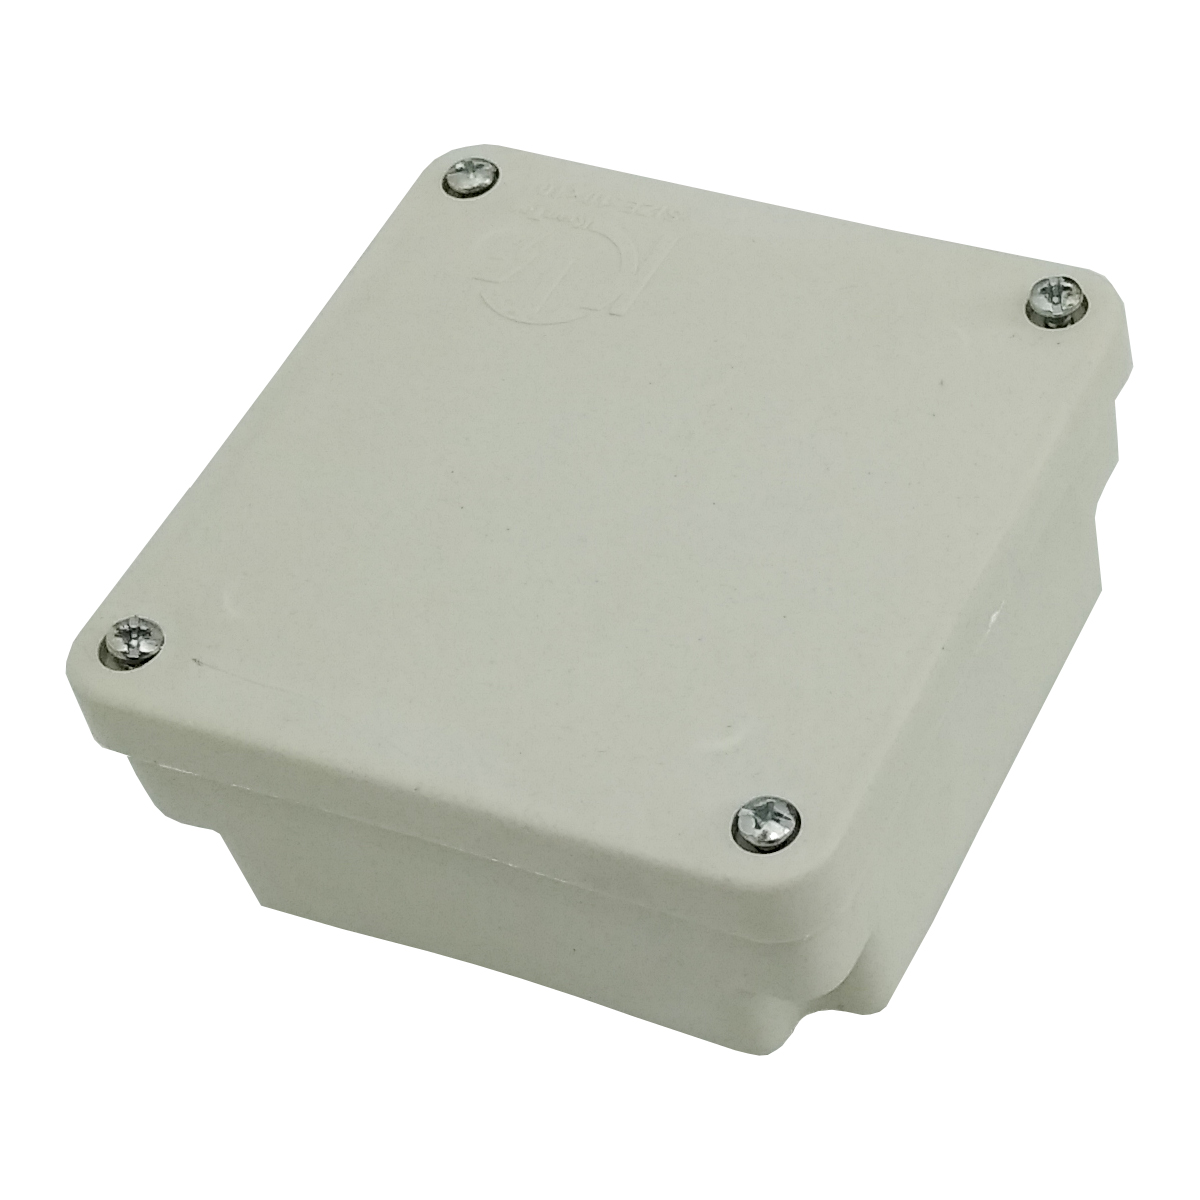 جعبه تقسیم کیان تک مدل 10×10 کد 10